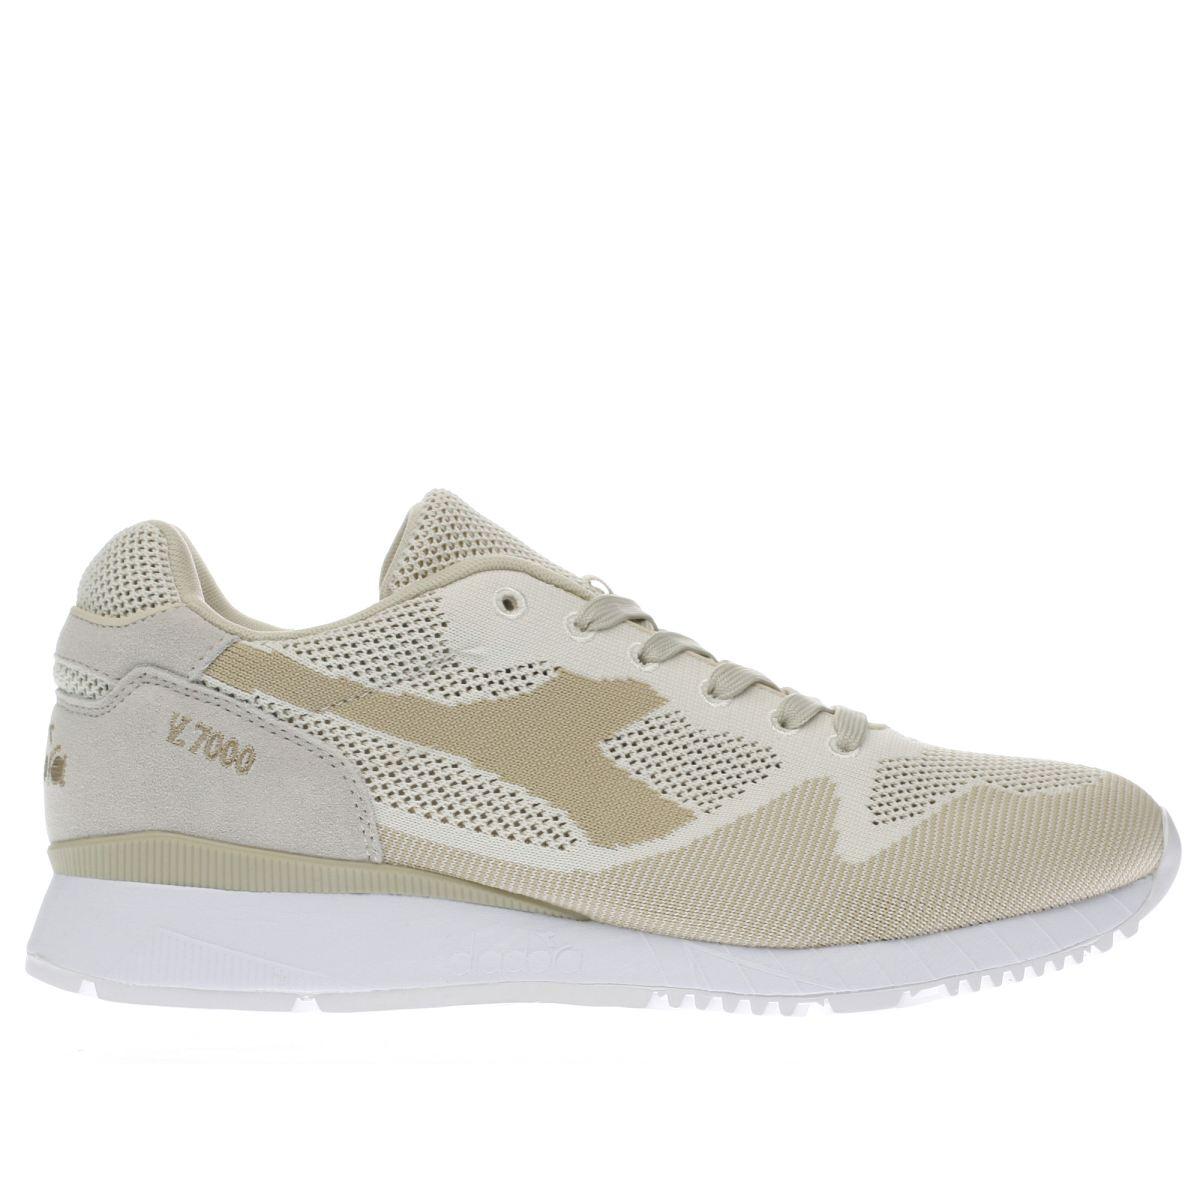 diadora beige v7000 weave trainers Review 73b5c8400bb